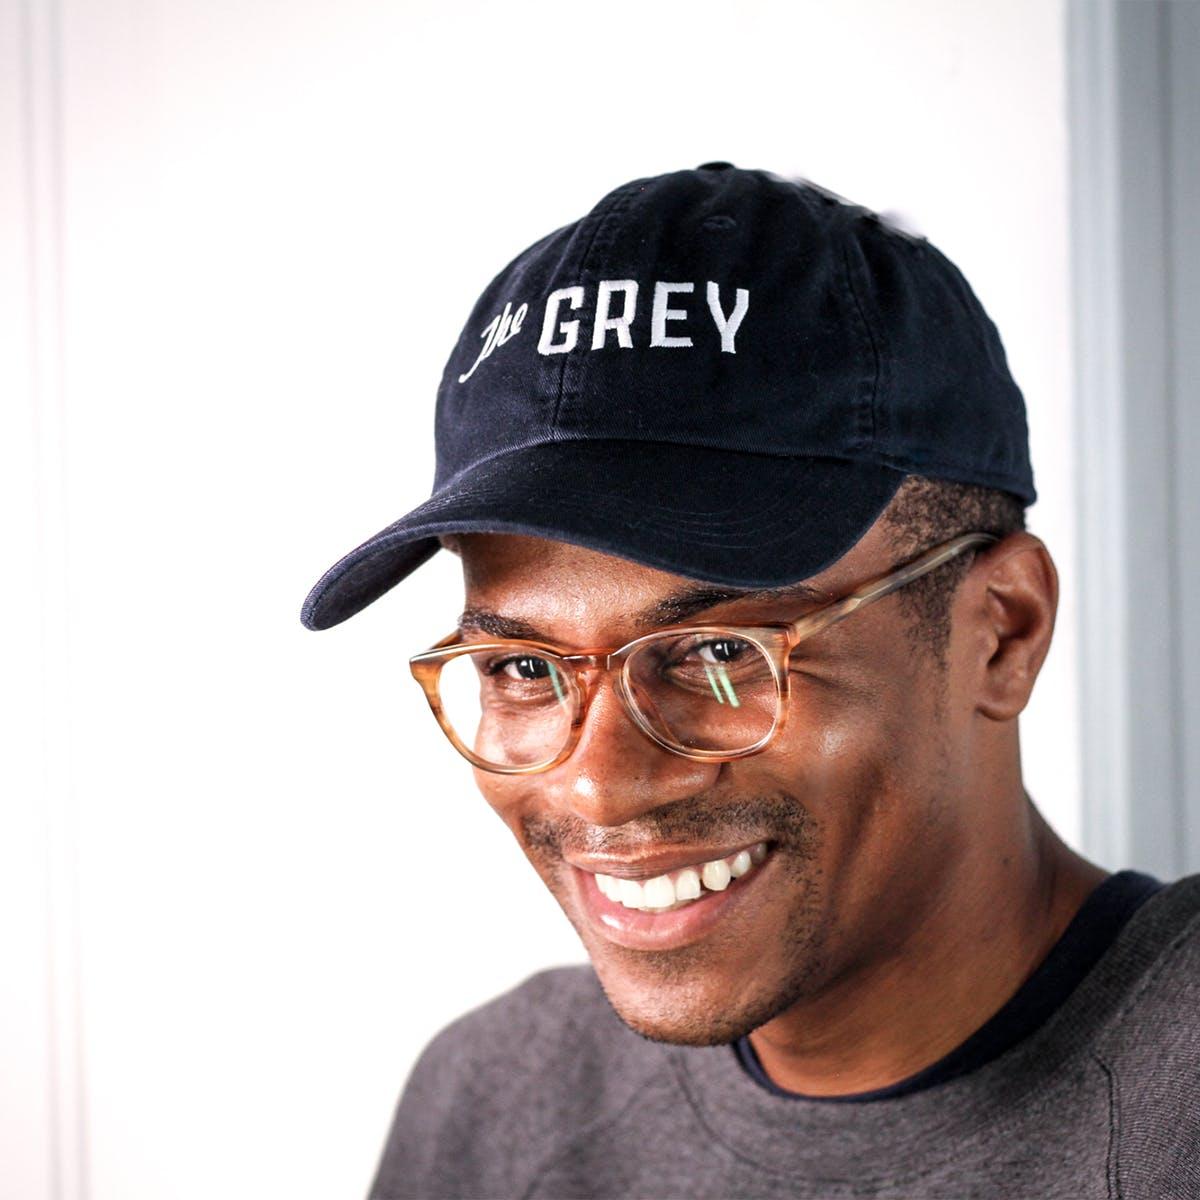 The Grey - The Grey Restaurant Ball Cap